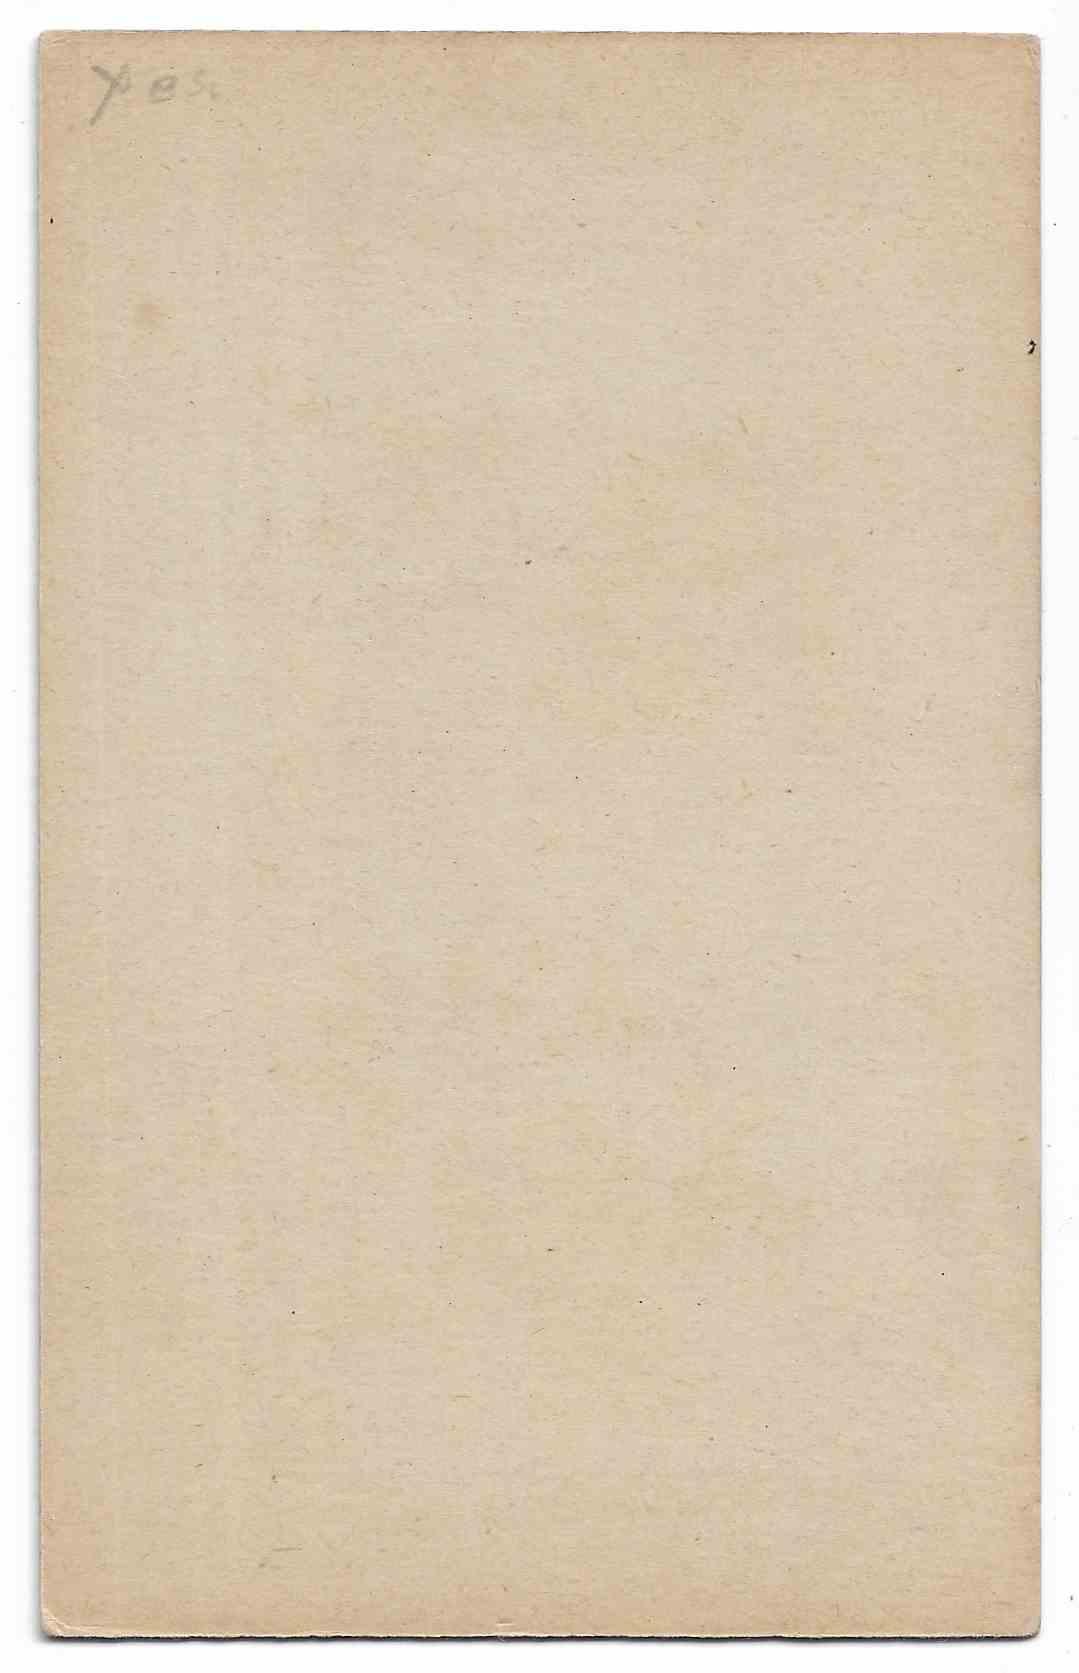 1947 Exhibits Kenn Keltner card back image